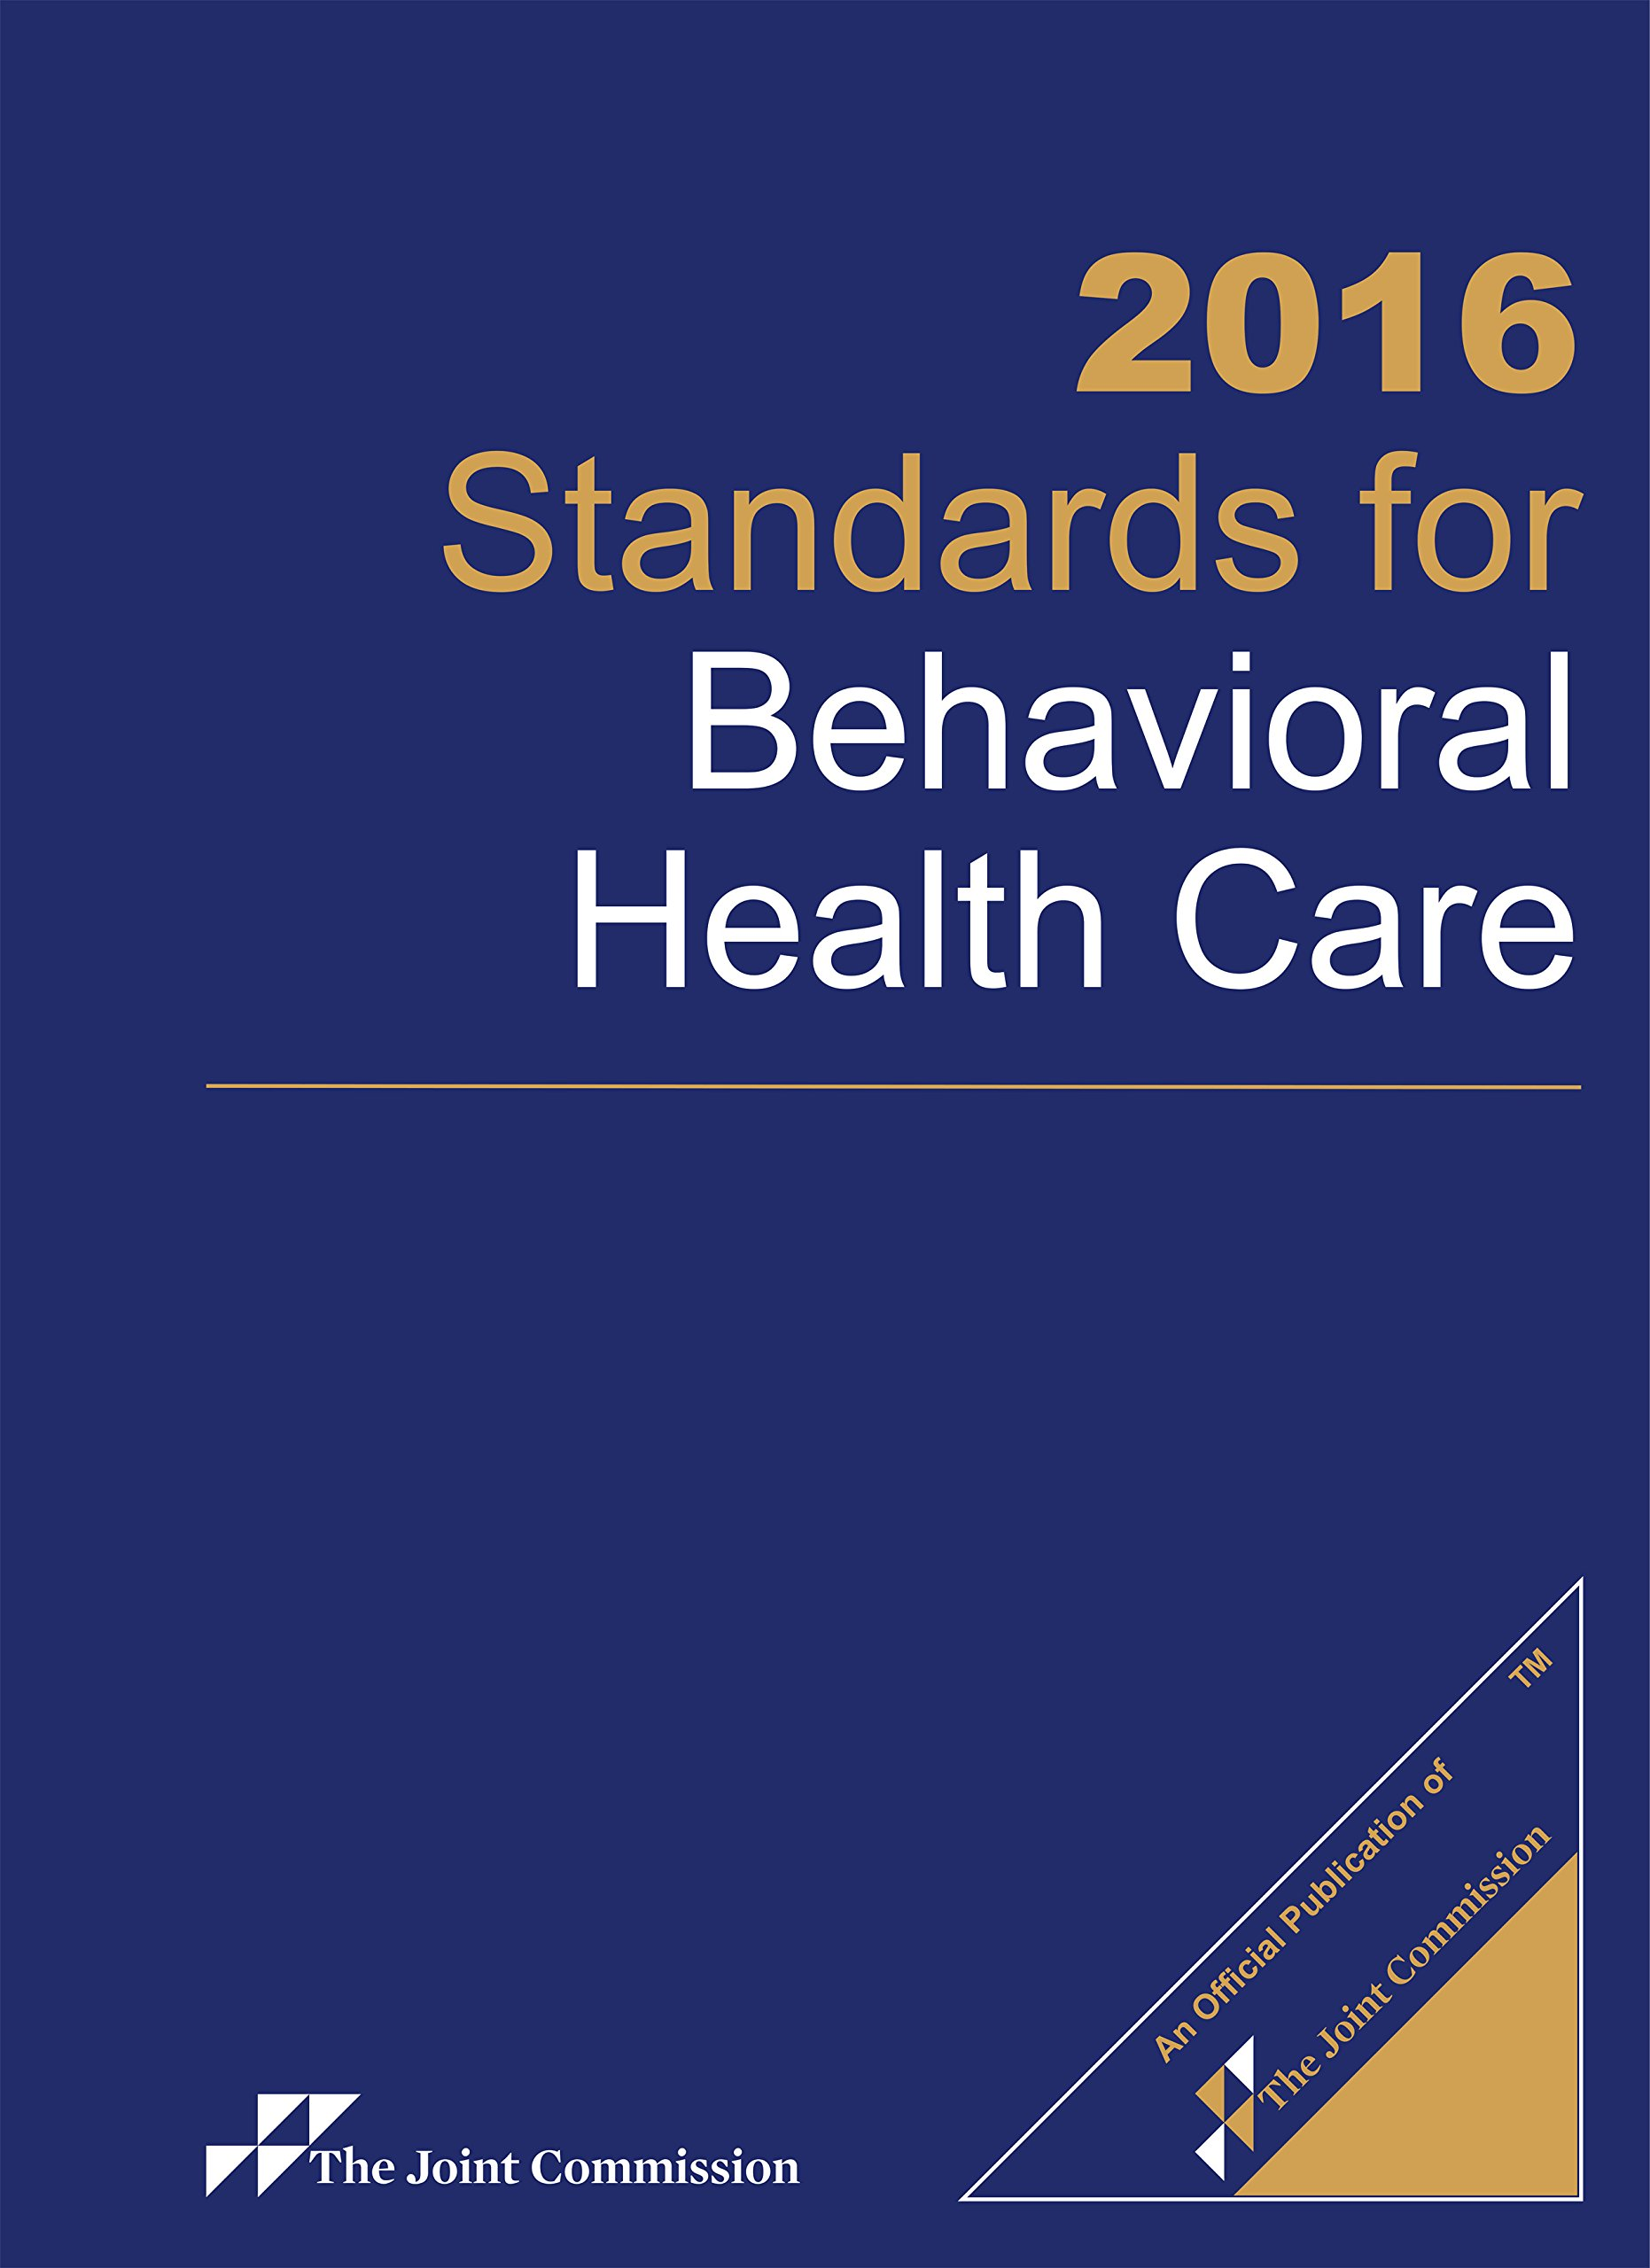 2016 Standards for Behavioral Health Care